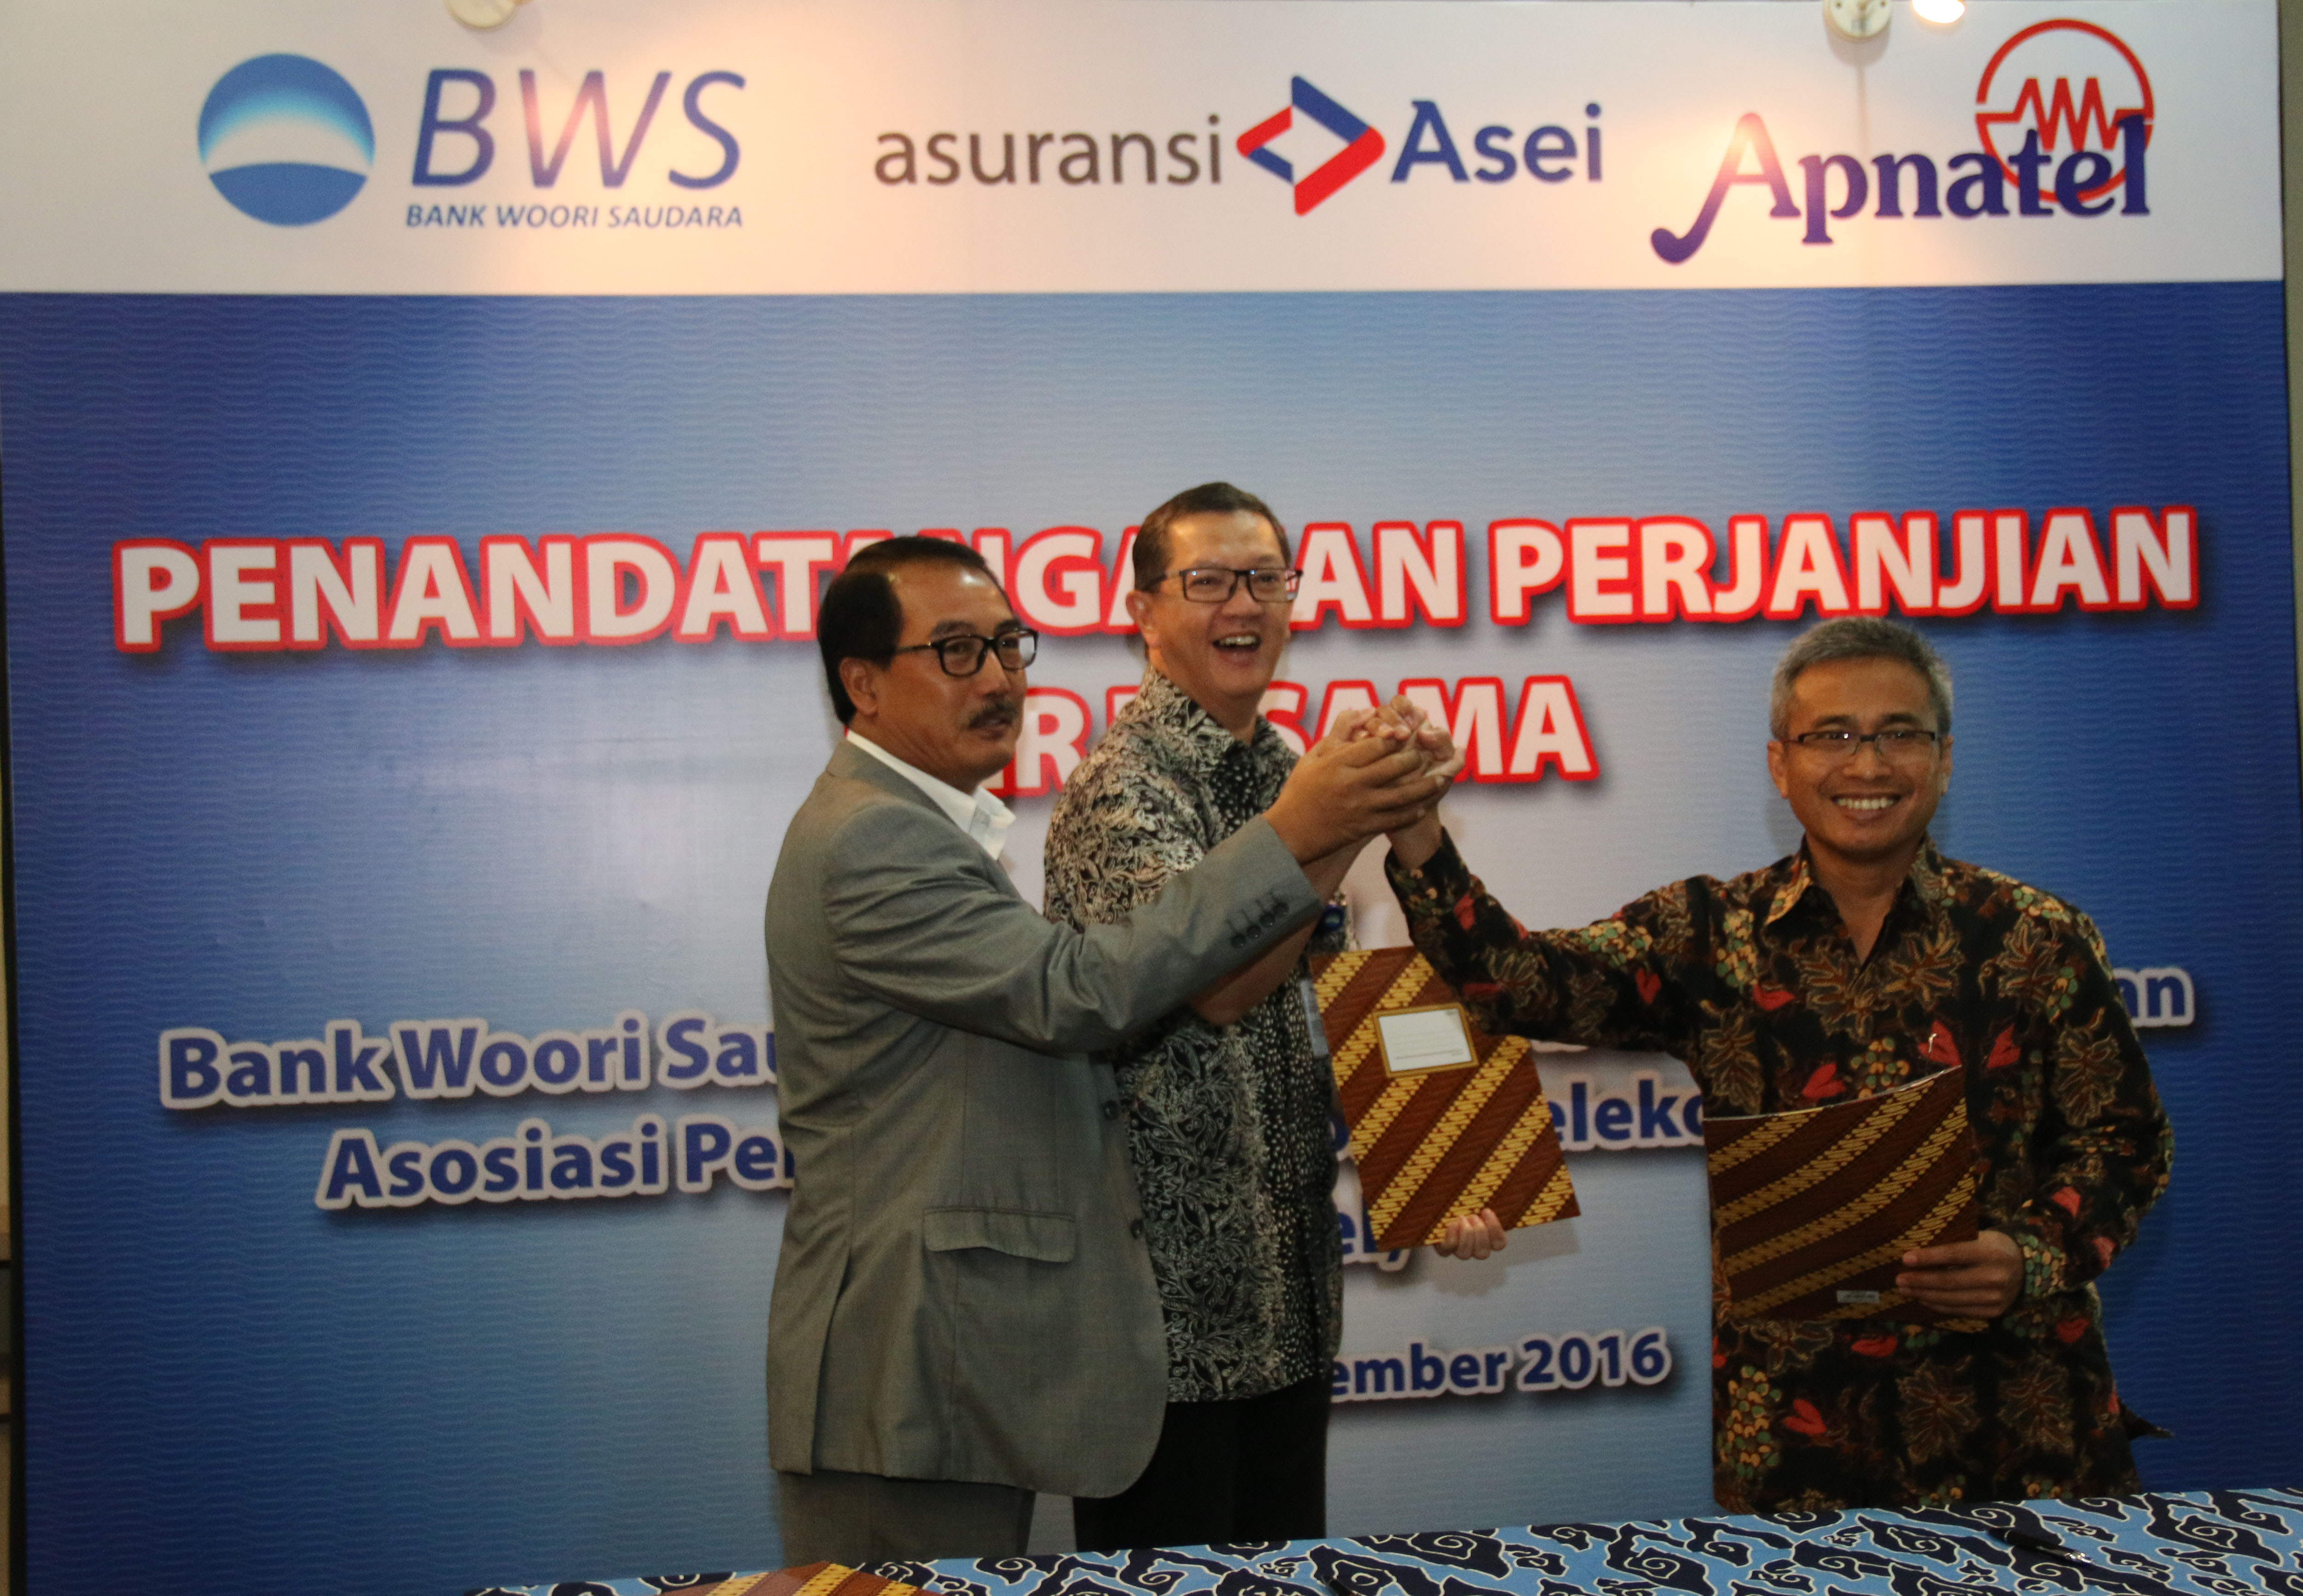 Penandatanganan Perjanjian Kerjasama Antara Asuransi Asei, Bank Woori Saudara & APNATEL